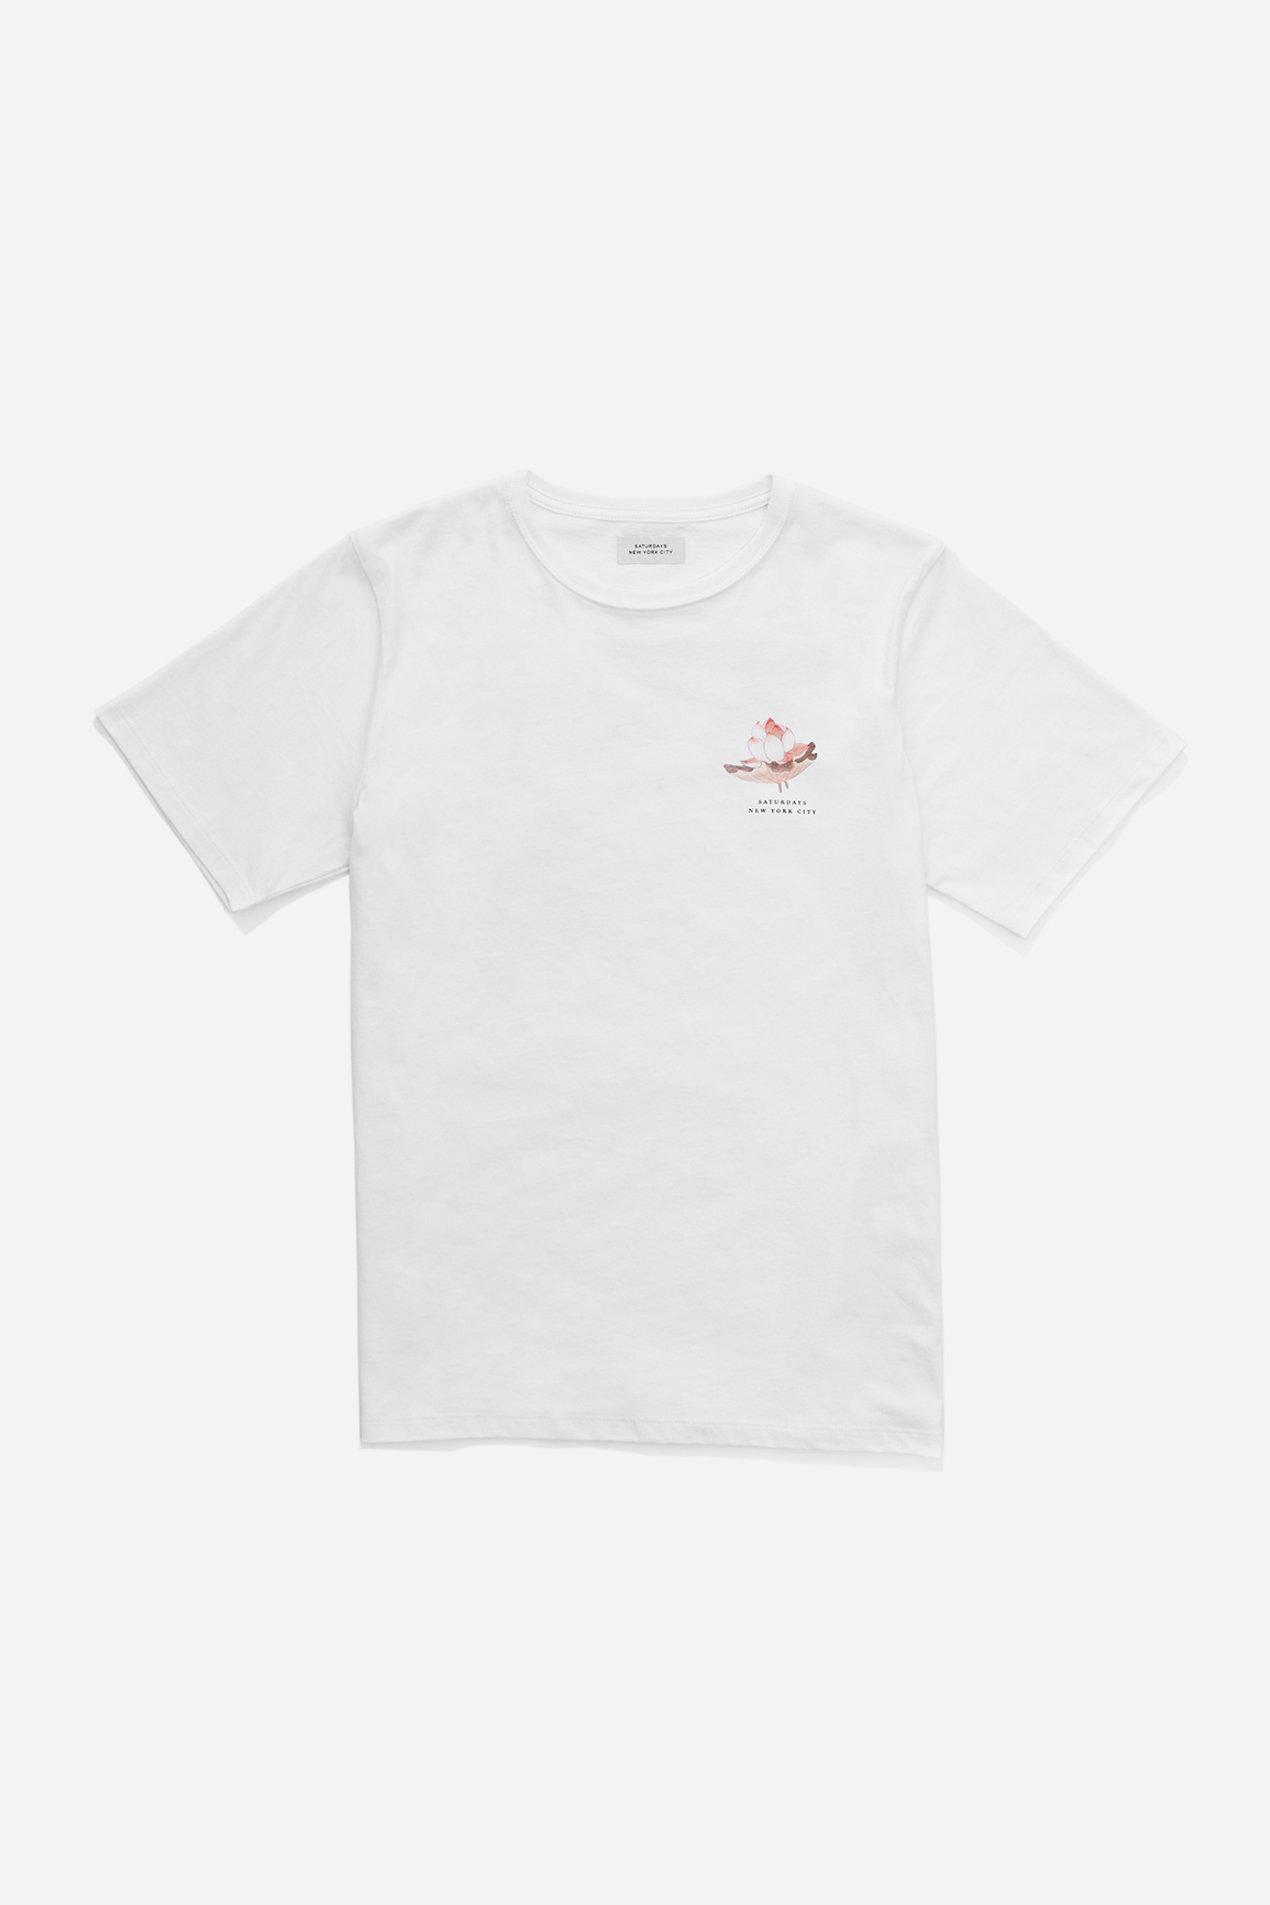 Lyst saturdays nyc lotus flower t shirt in white for men gallery izmirmasajfo